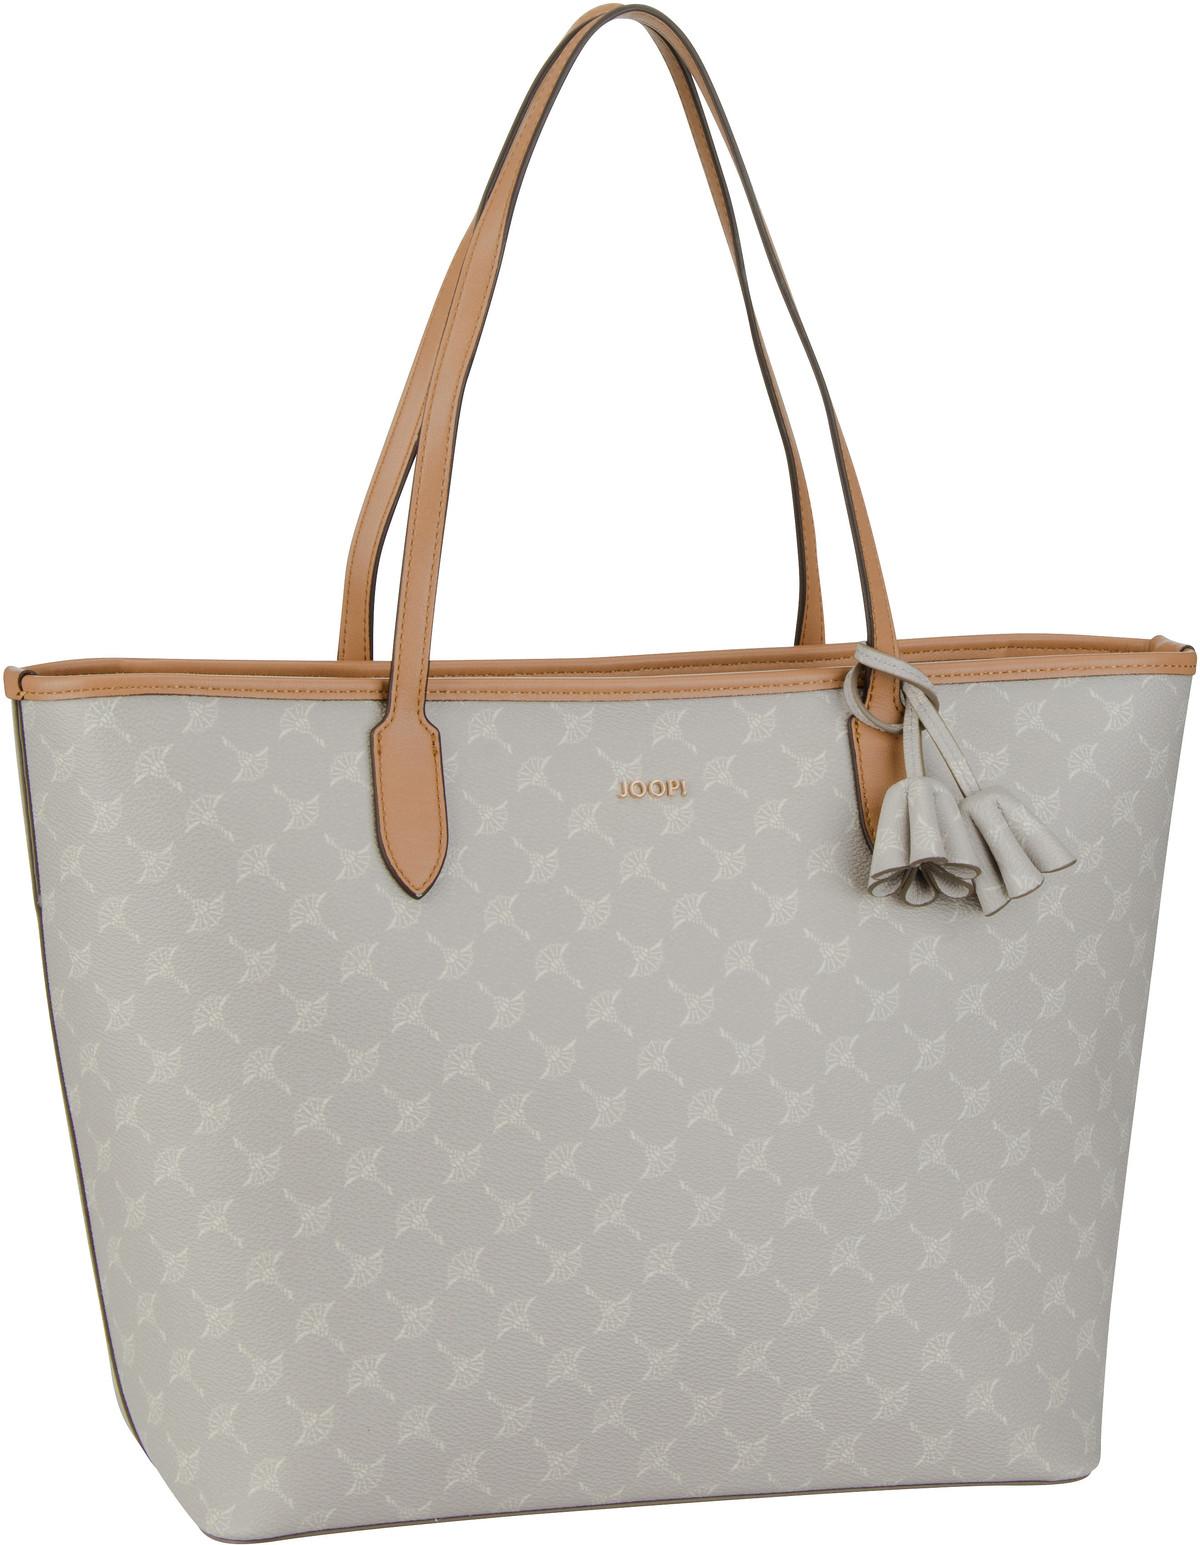 Handtasche Cortina Lara Shopper LHZ Lightgrey